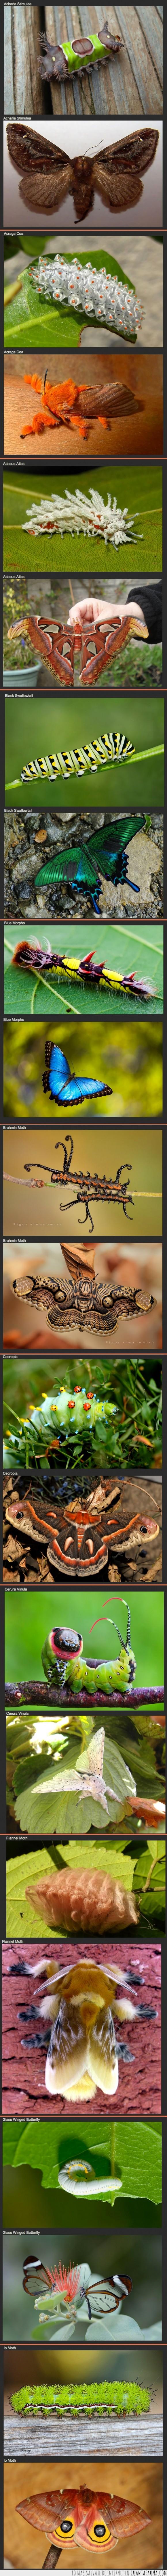 crisalida,mariposa,oruga,polilla,tipo